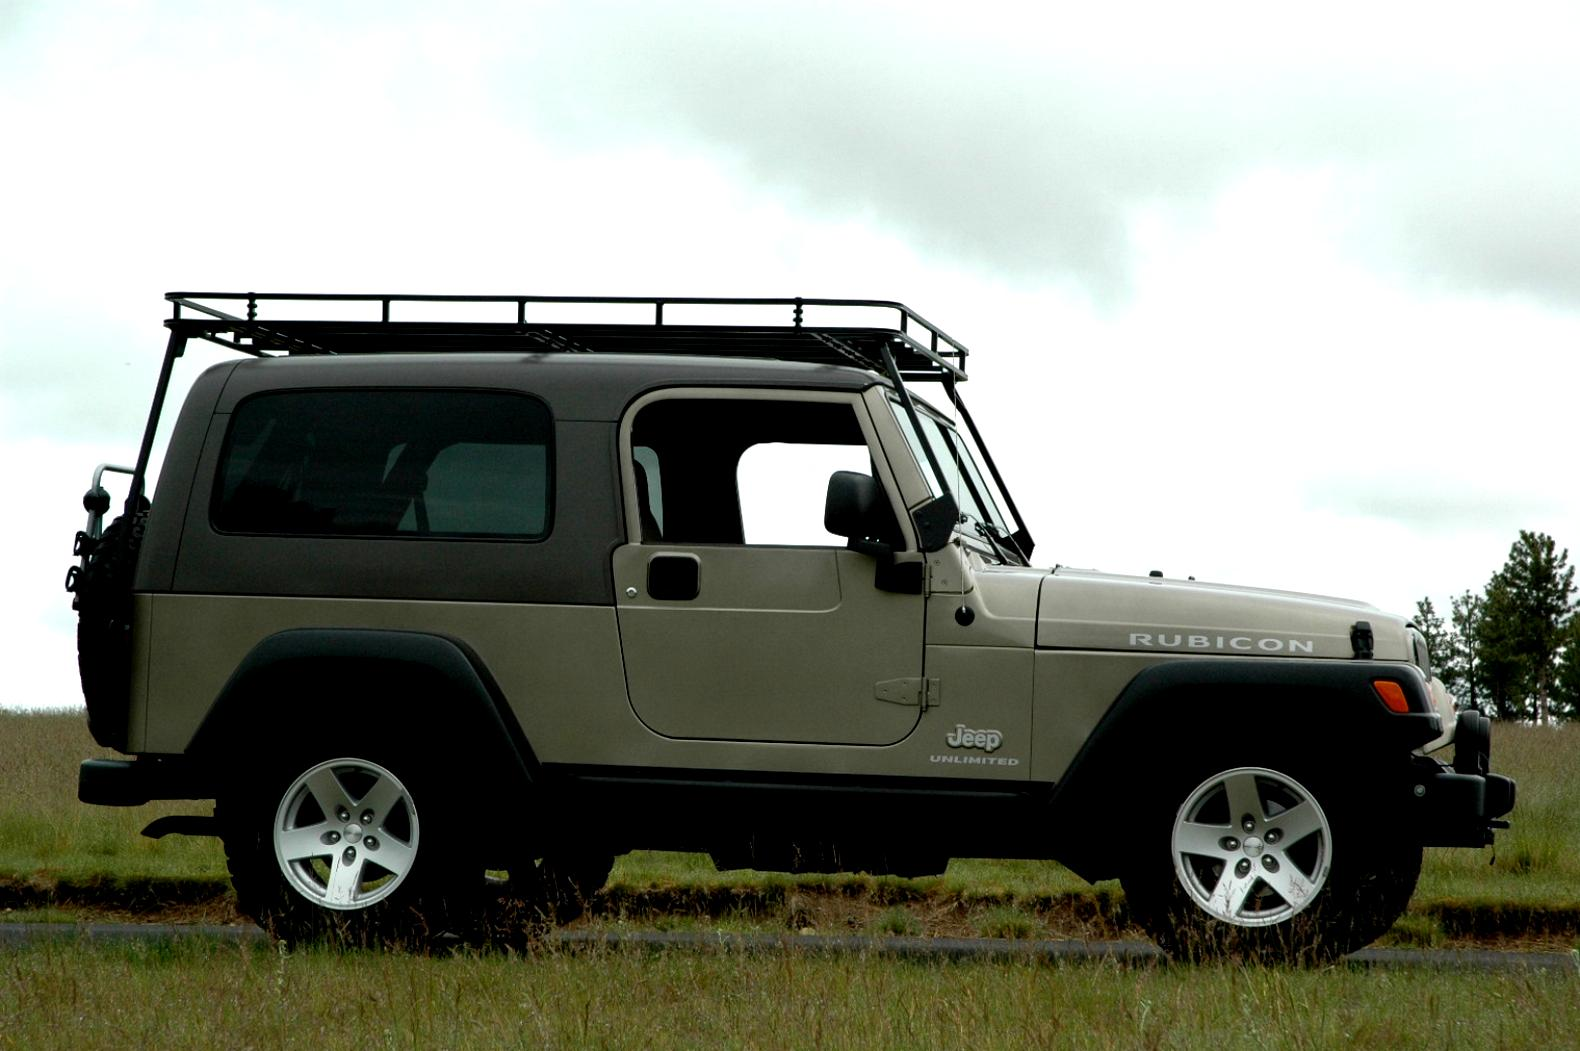 jeep wrangler rubicon 2006 on. Black Bedroom Furniture Sets. Home Design Ideas